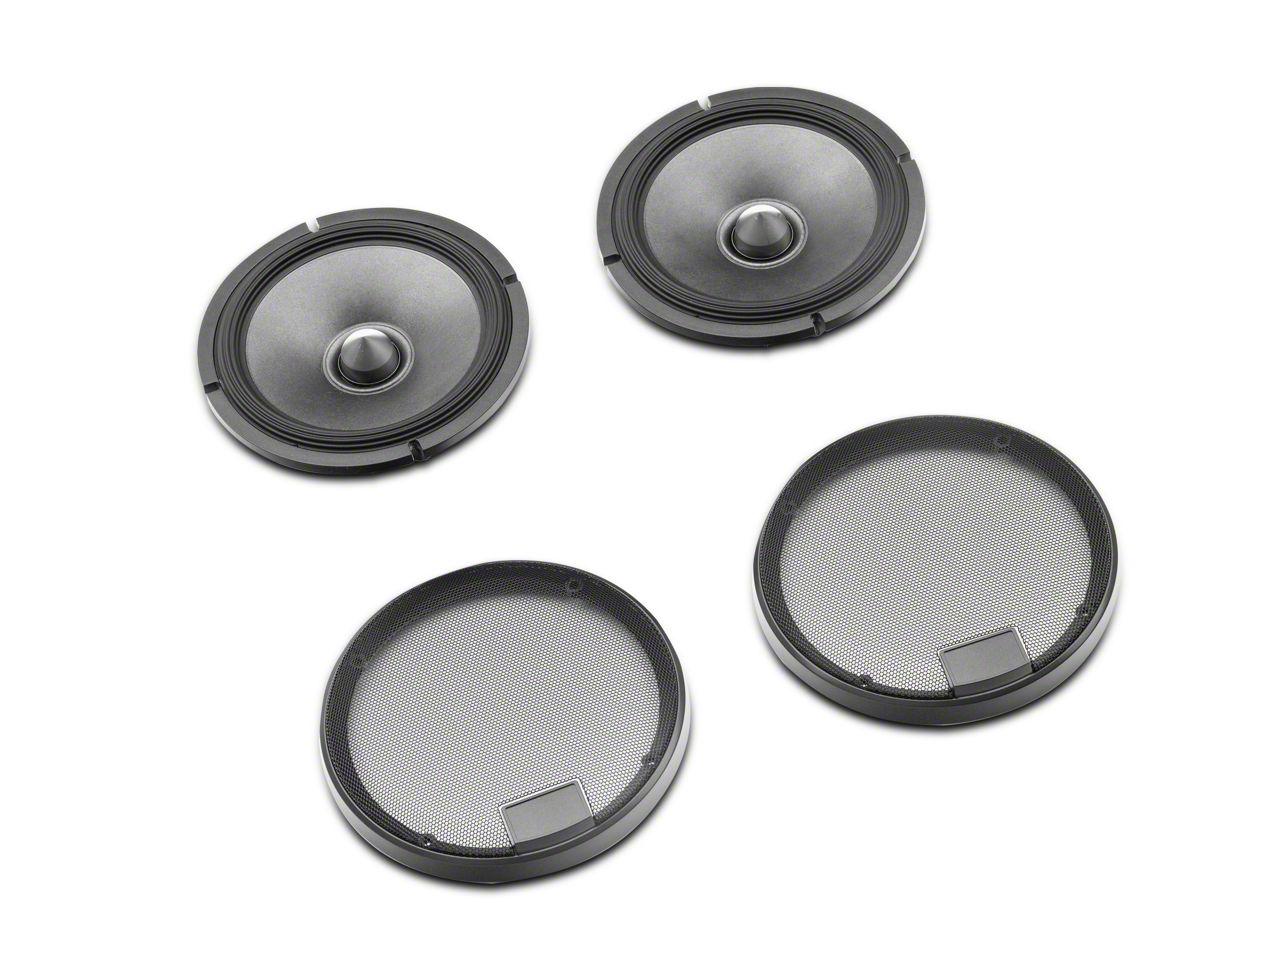 Alpine R-Series 6-1/2 in. Component 2-Way Speaker System - 100W (07-18 Jeep Wrangler JK)